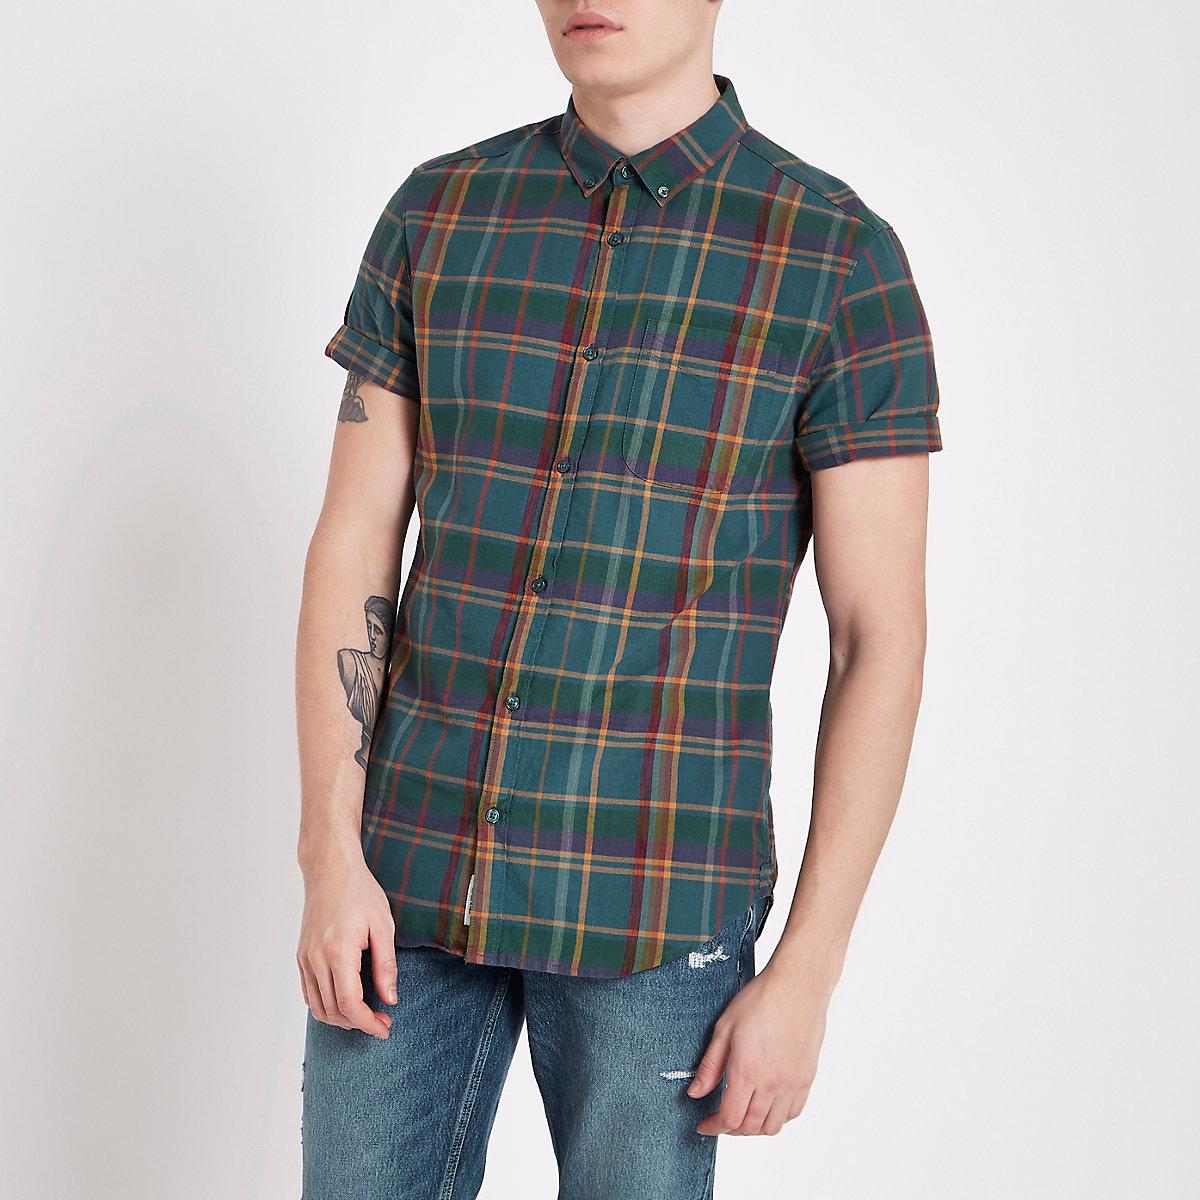 Teal green check short sleeve shirt